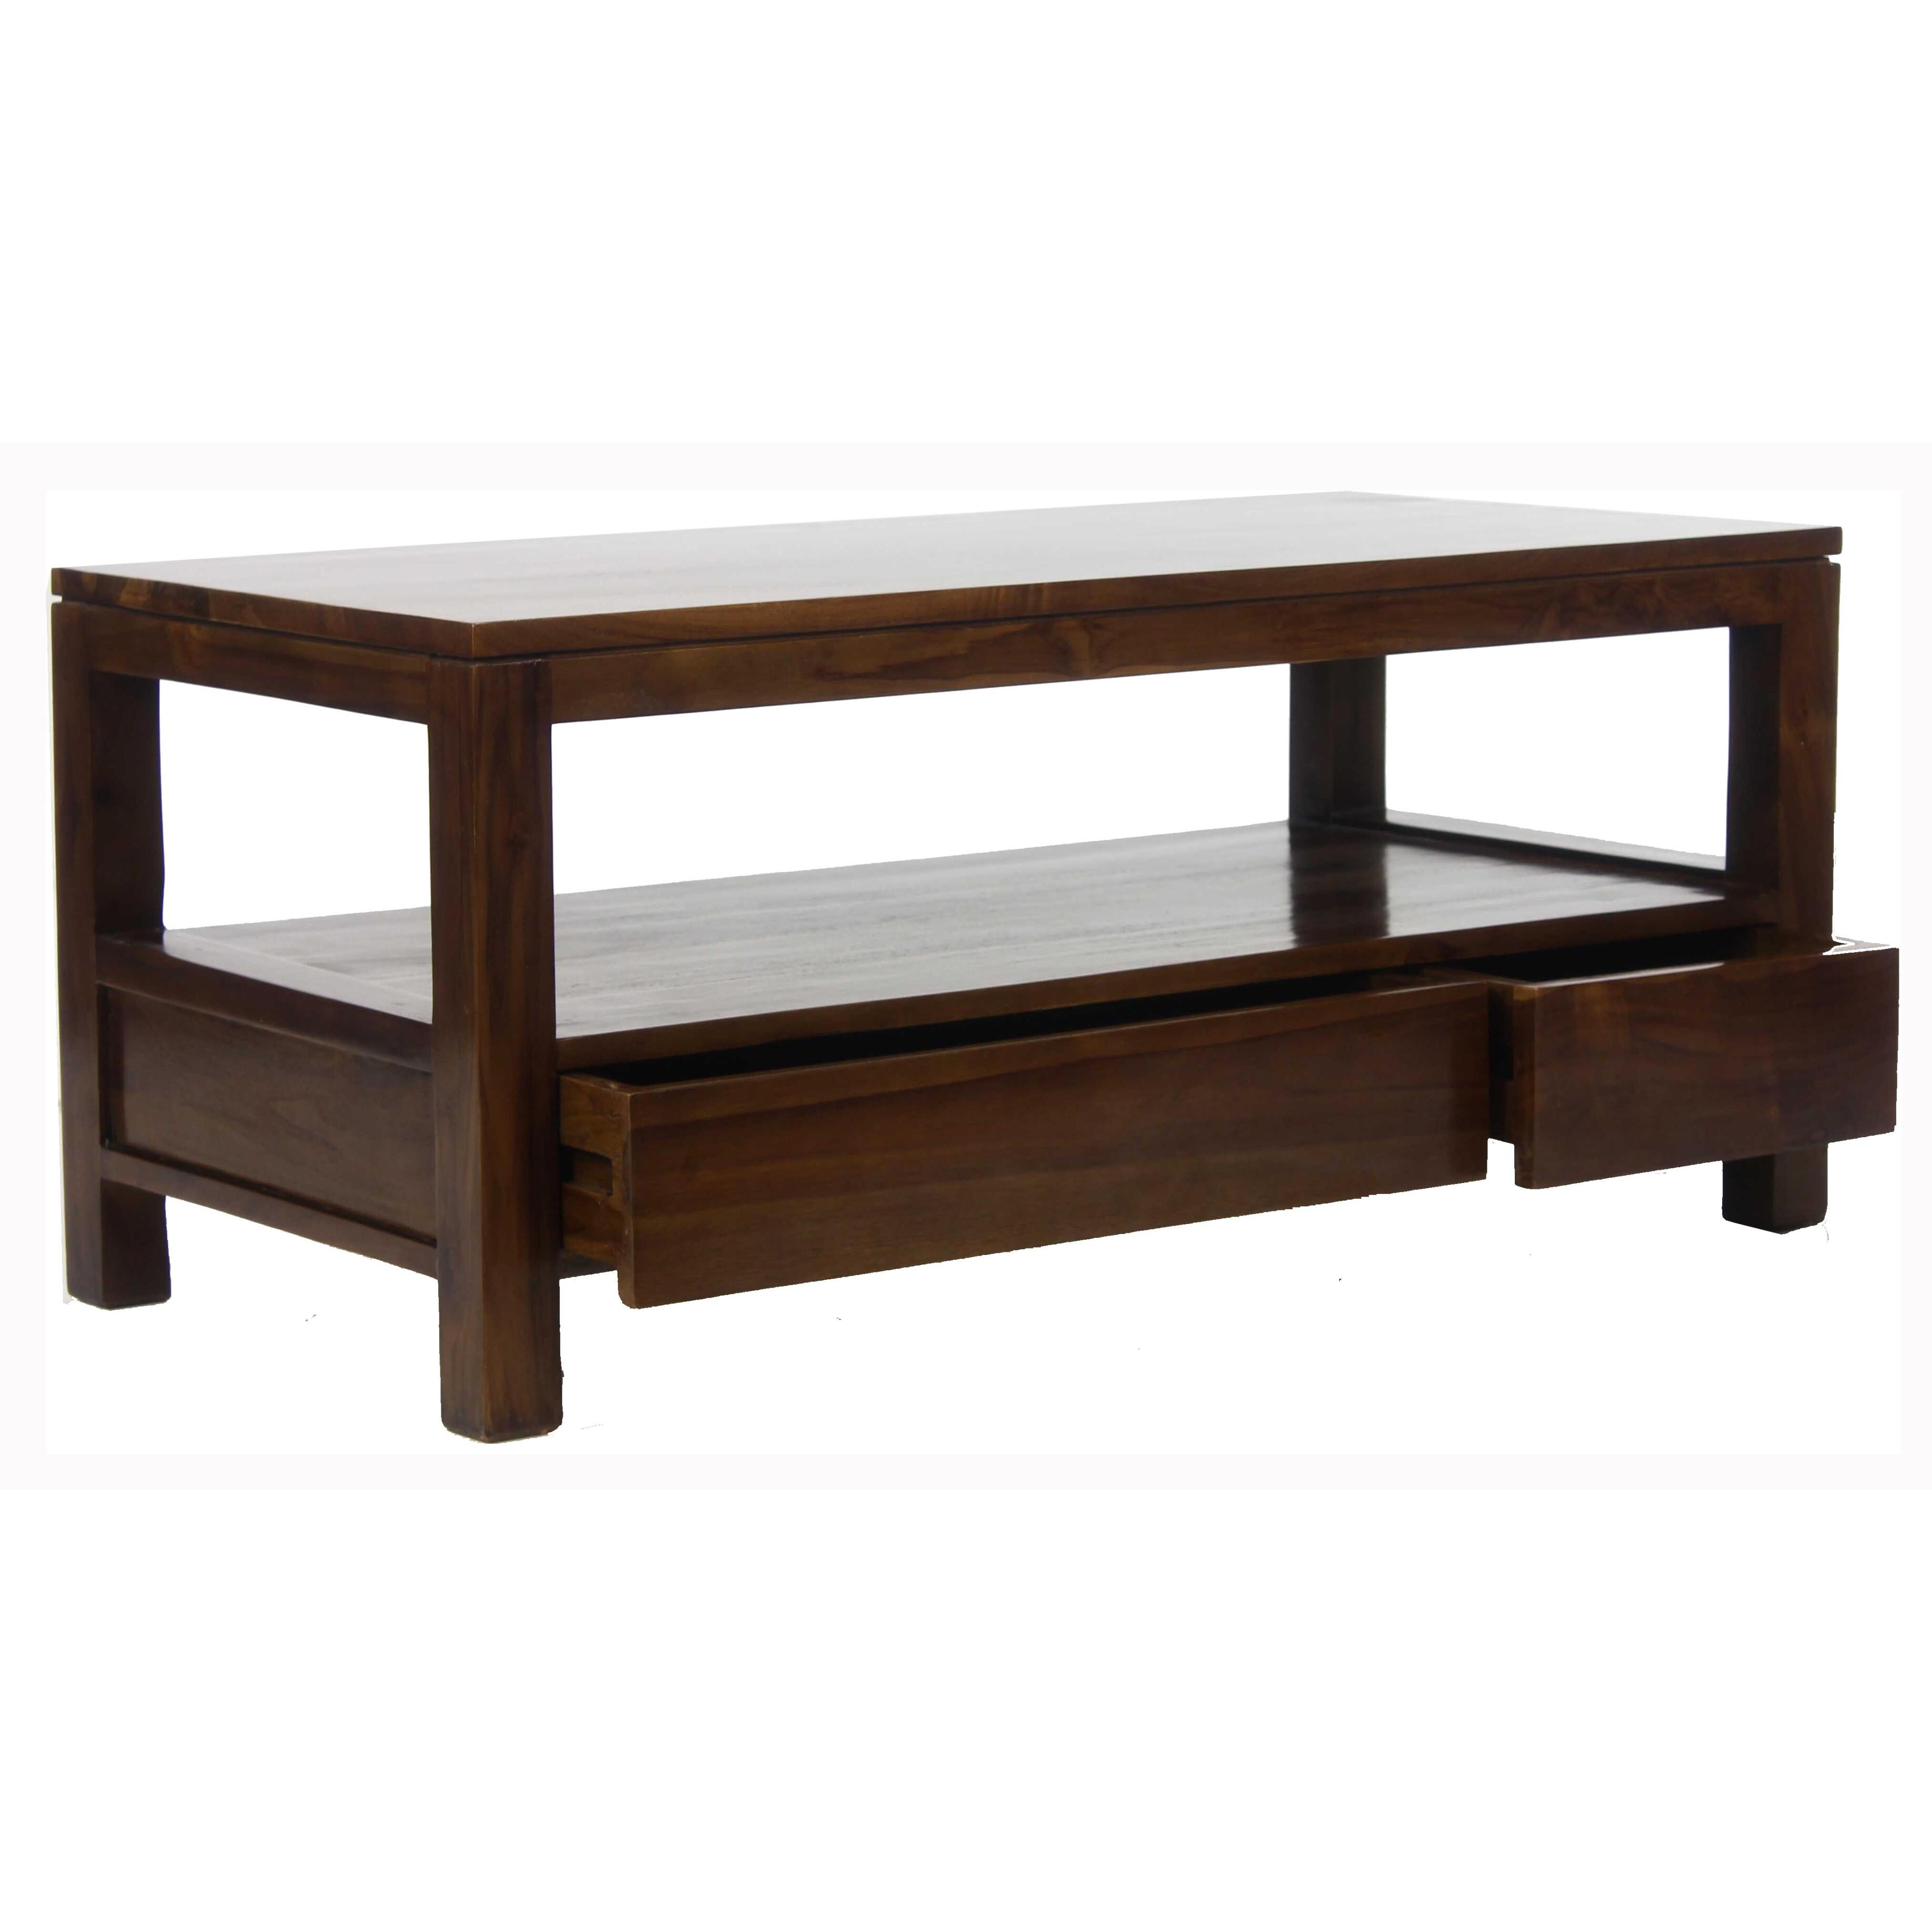 Coffee Table Minimalist Retro: Furniture & Home Décor